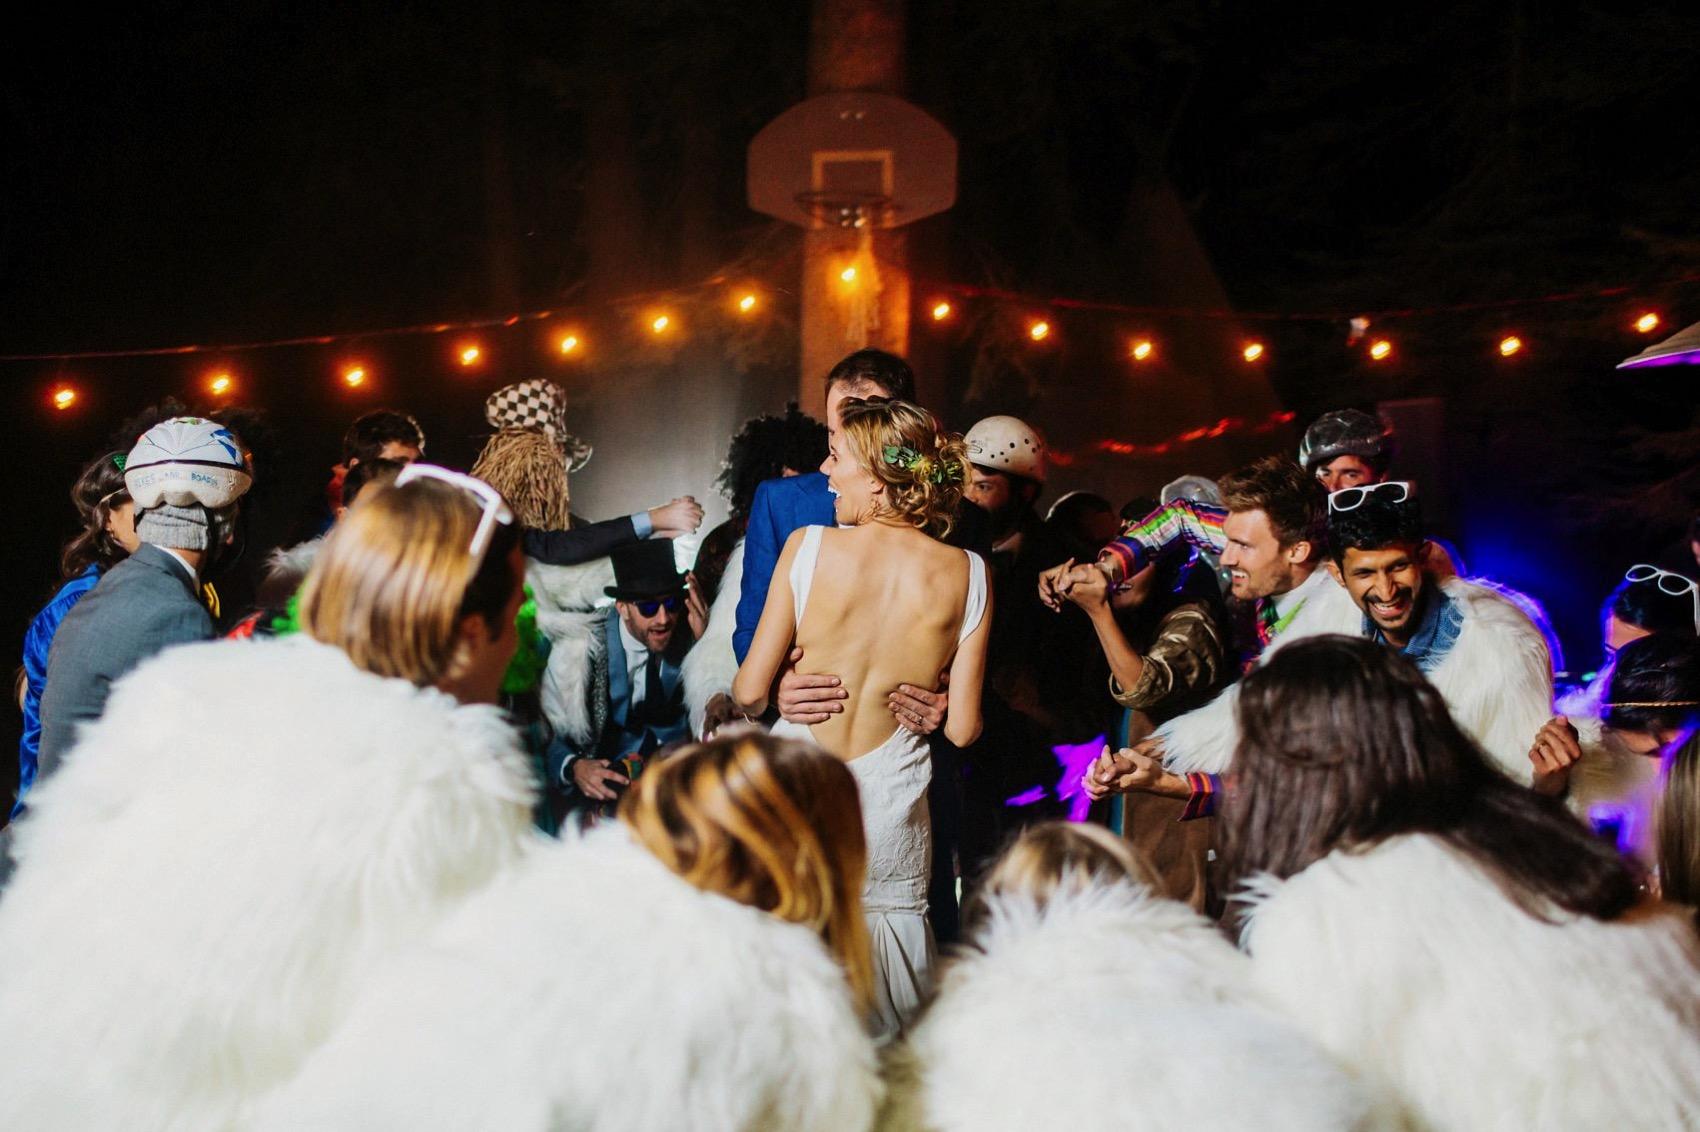 camp-shaffer-wedding-the-goodness-photo-213-photo.jpg